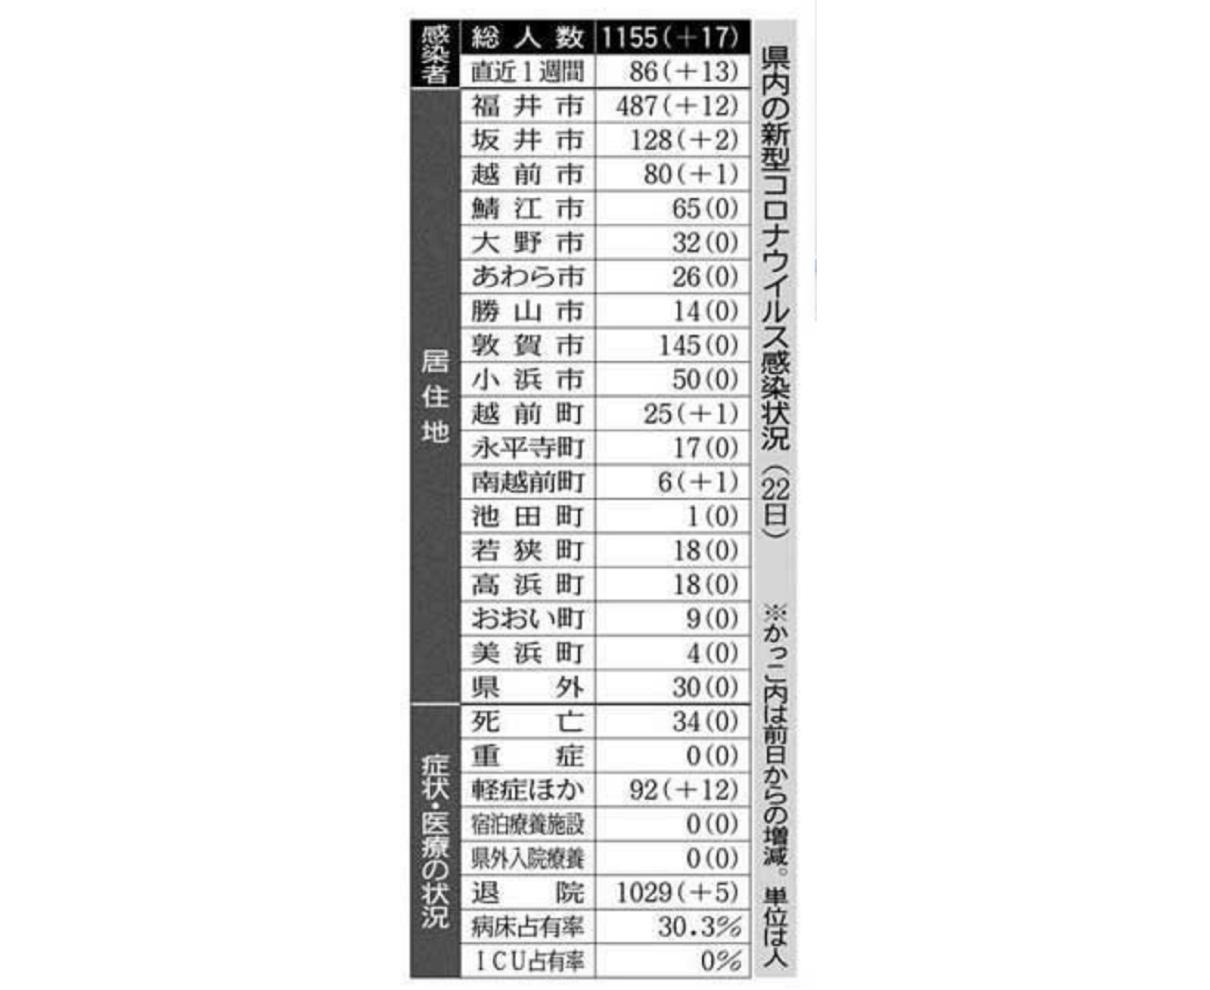 県内新たに17人感染 福井市中心部 飲食店関連計73人に